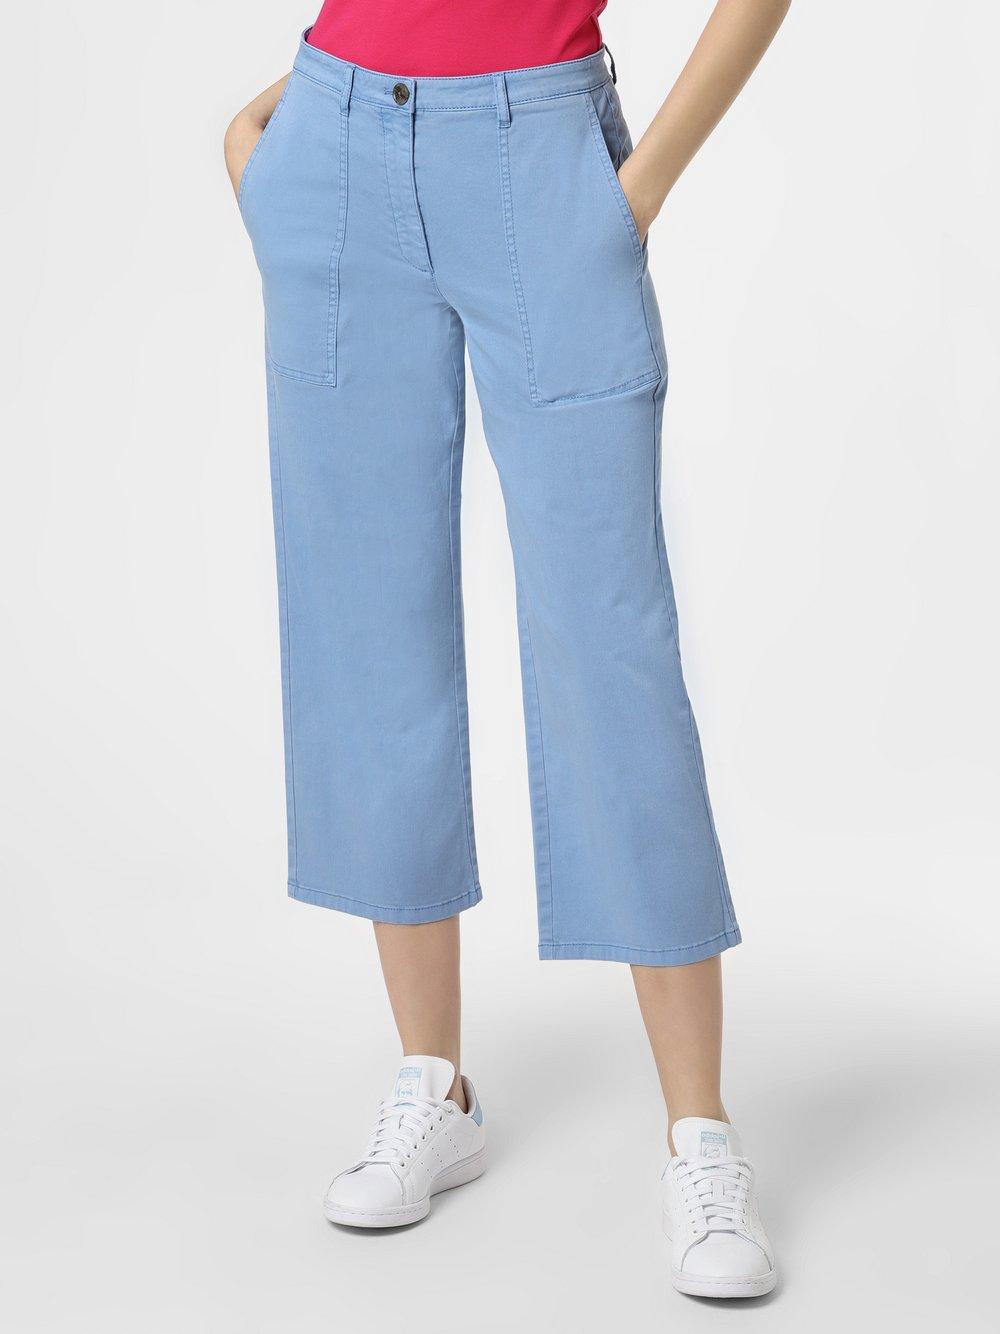 Marc O'Polo - Spodnie damskie, niebieski